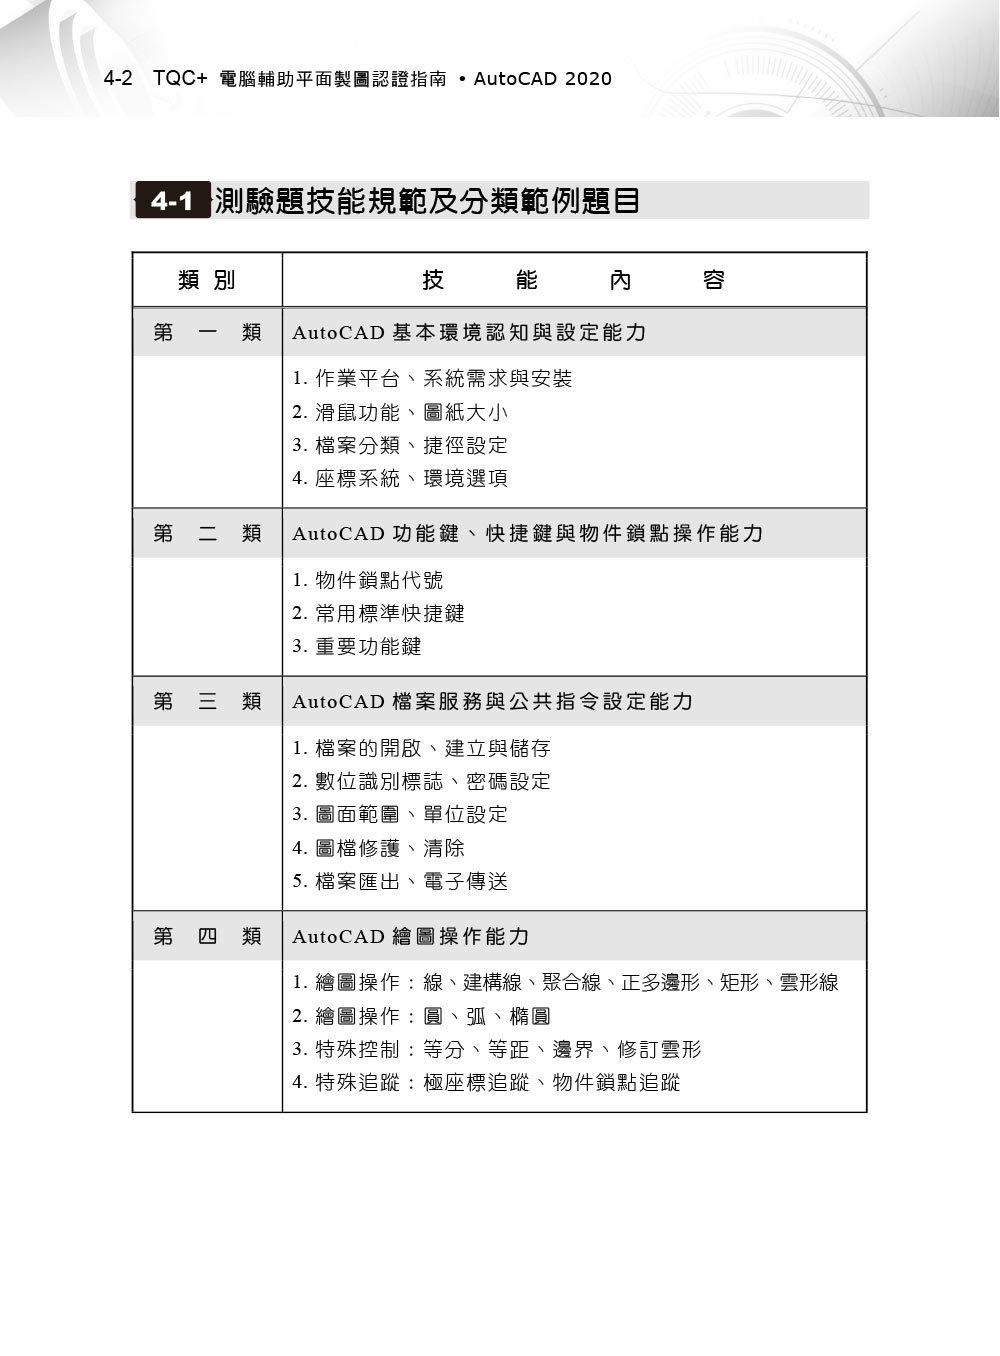 TQC+ 電腦輔助平面製圖認證指南 AutoCAD 2020-preview-2